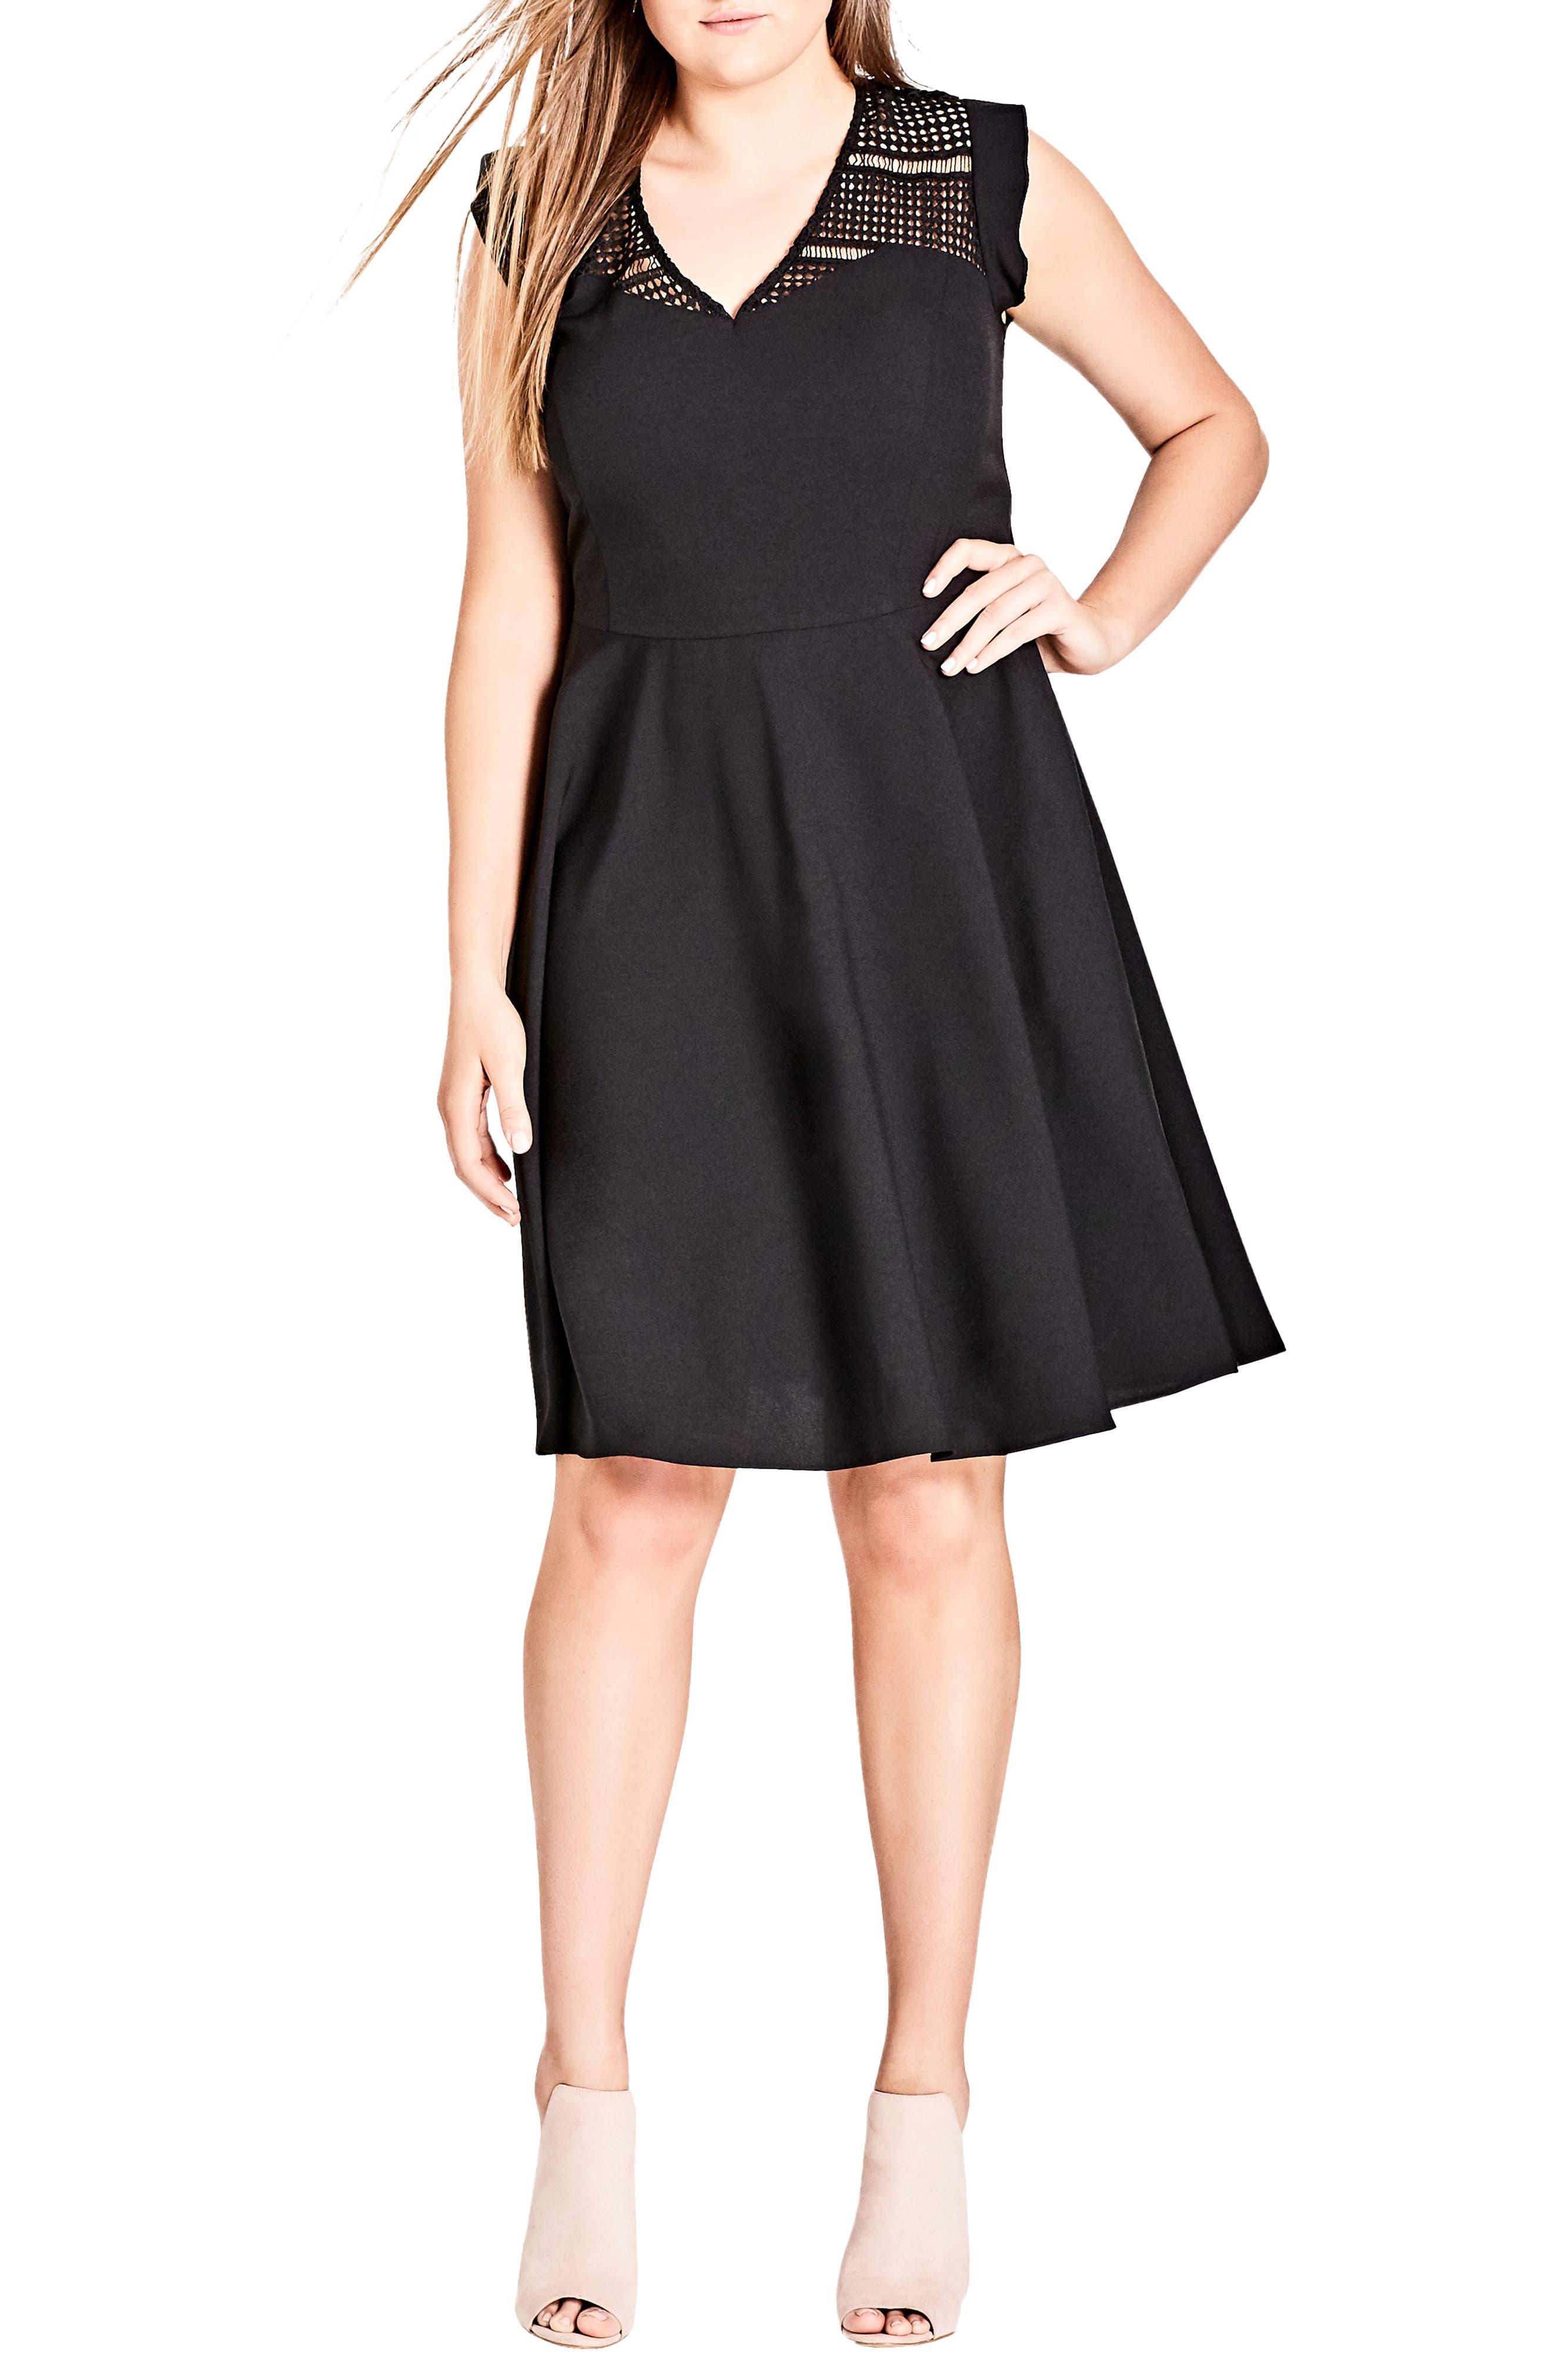 Plus Size City Chic First Place Crochet Yoke Fit & Flare Dress, Black